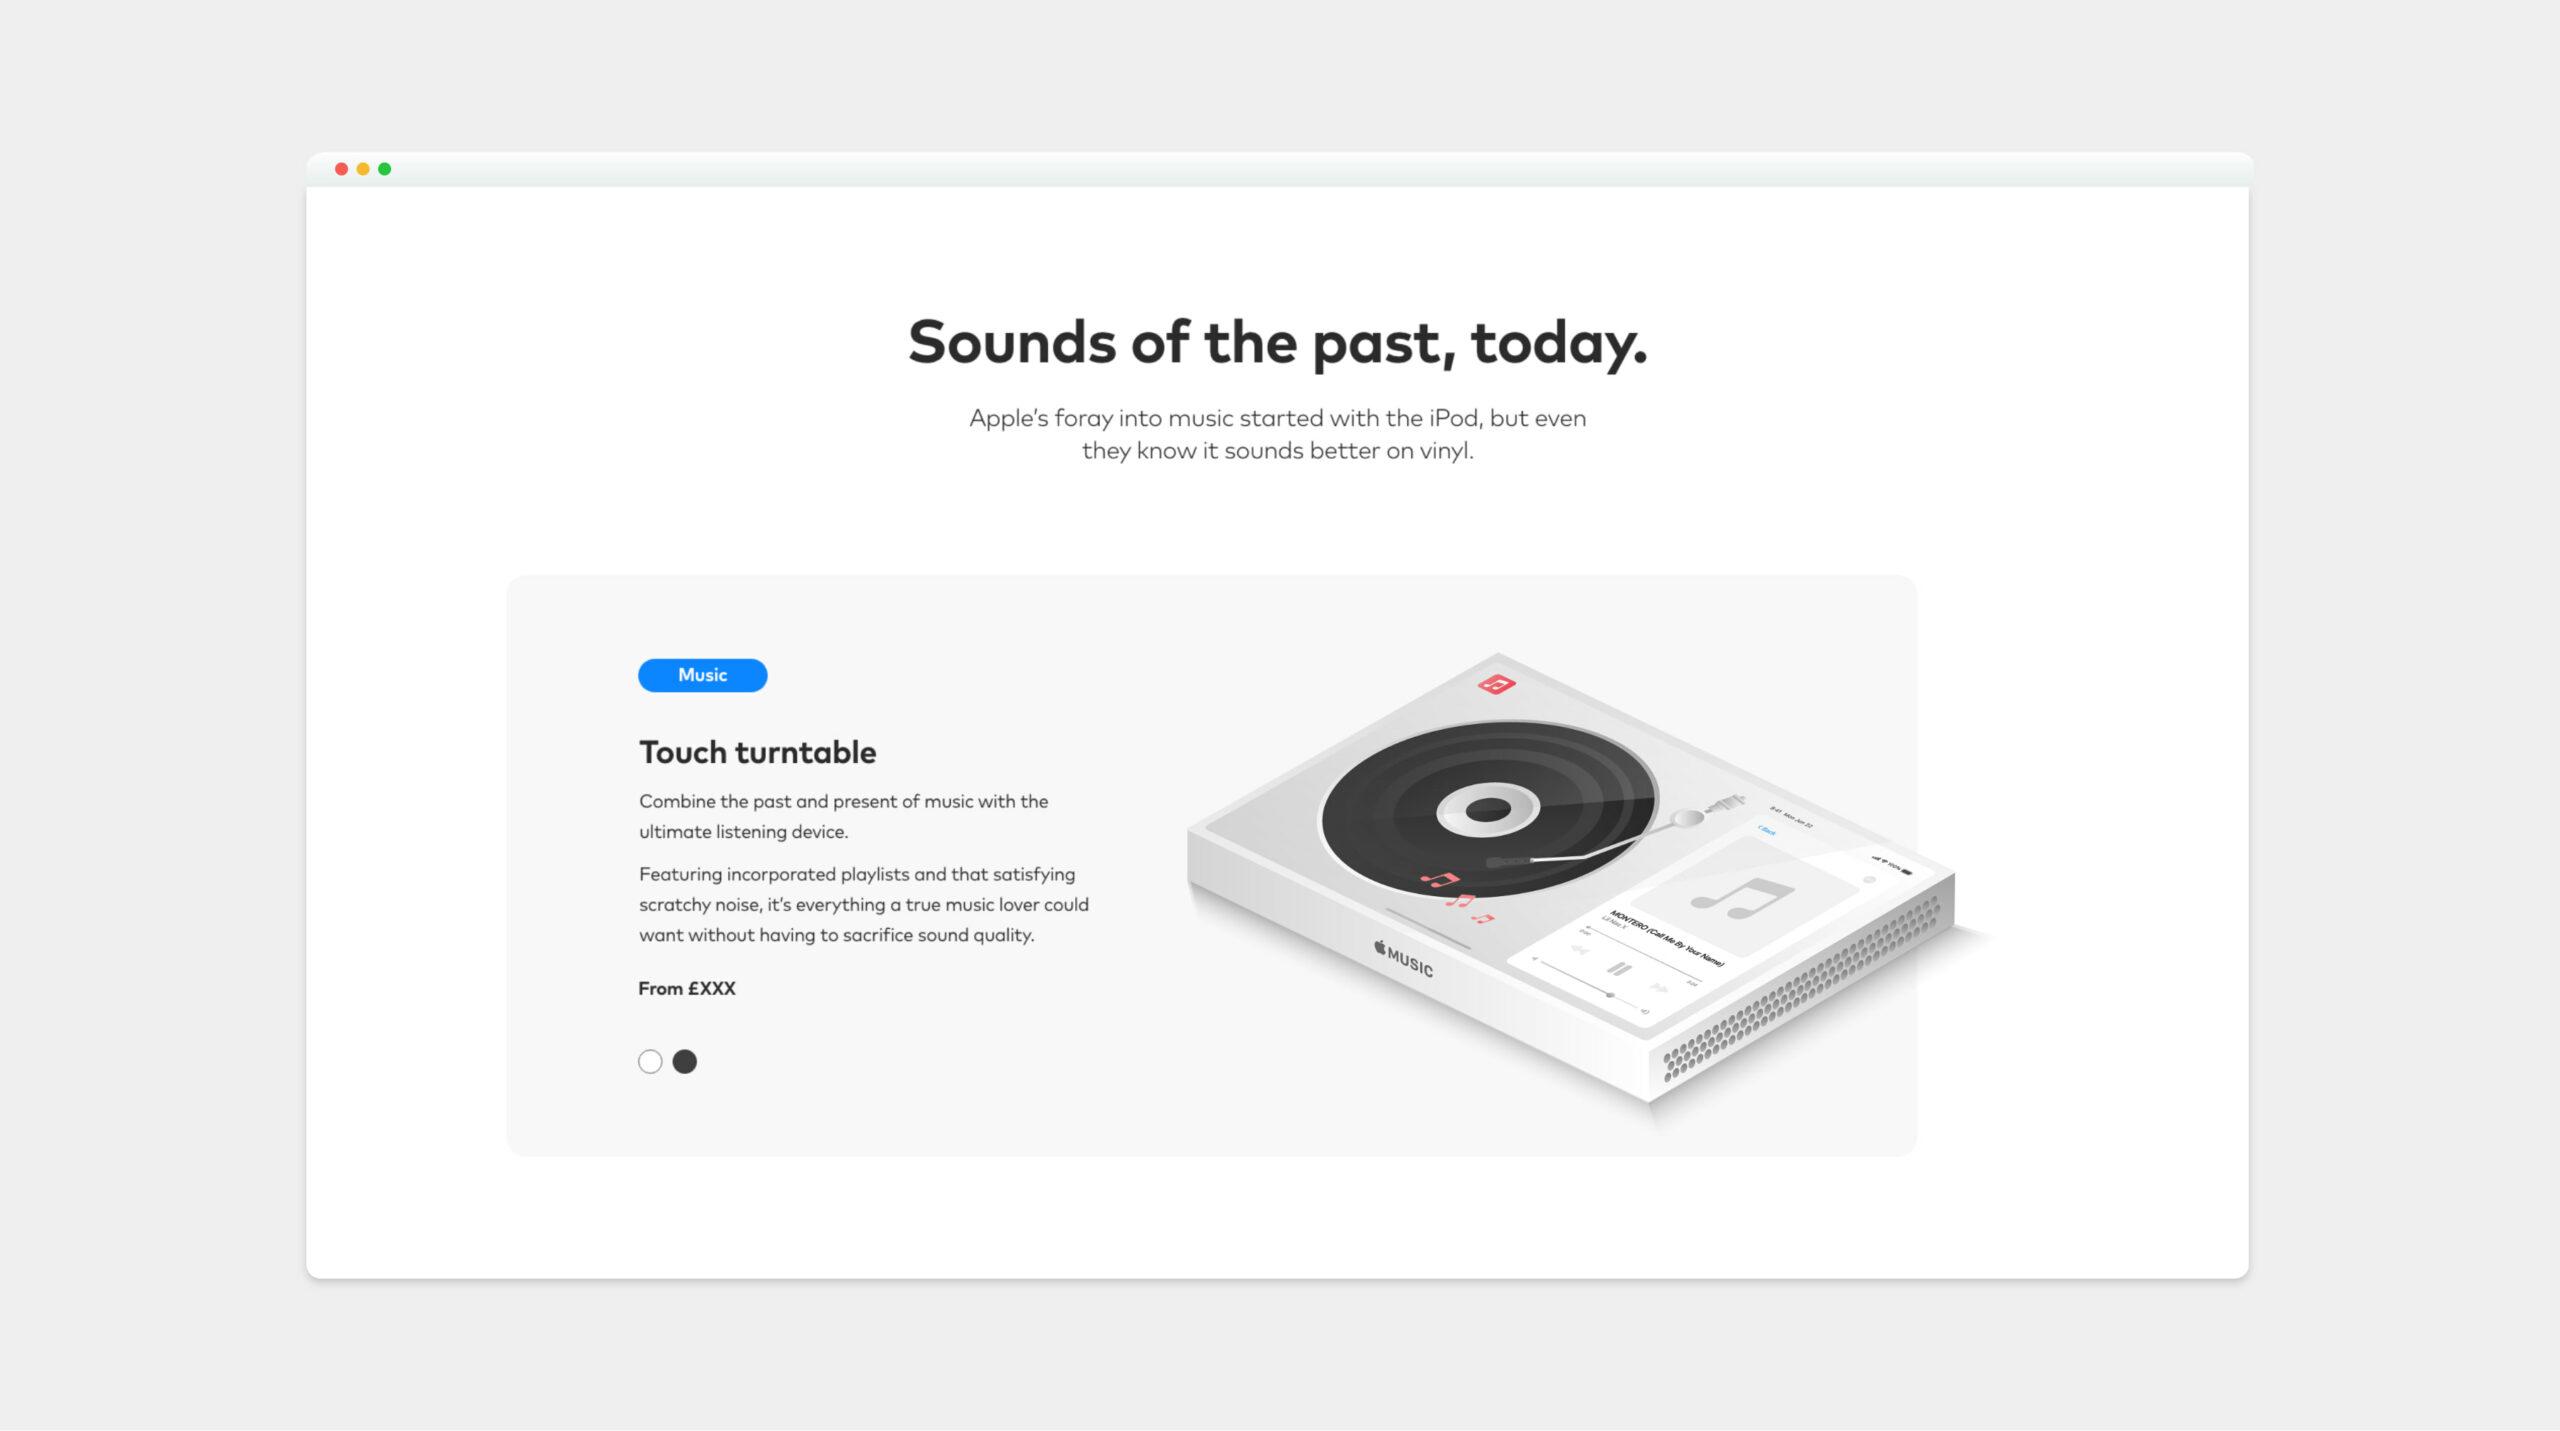 amy-jones-mackeeper-apple-collection-concept-web-design-4@2x